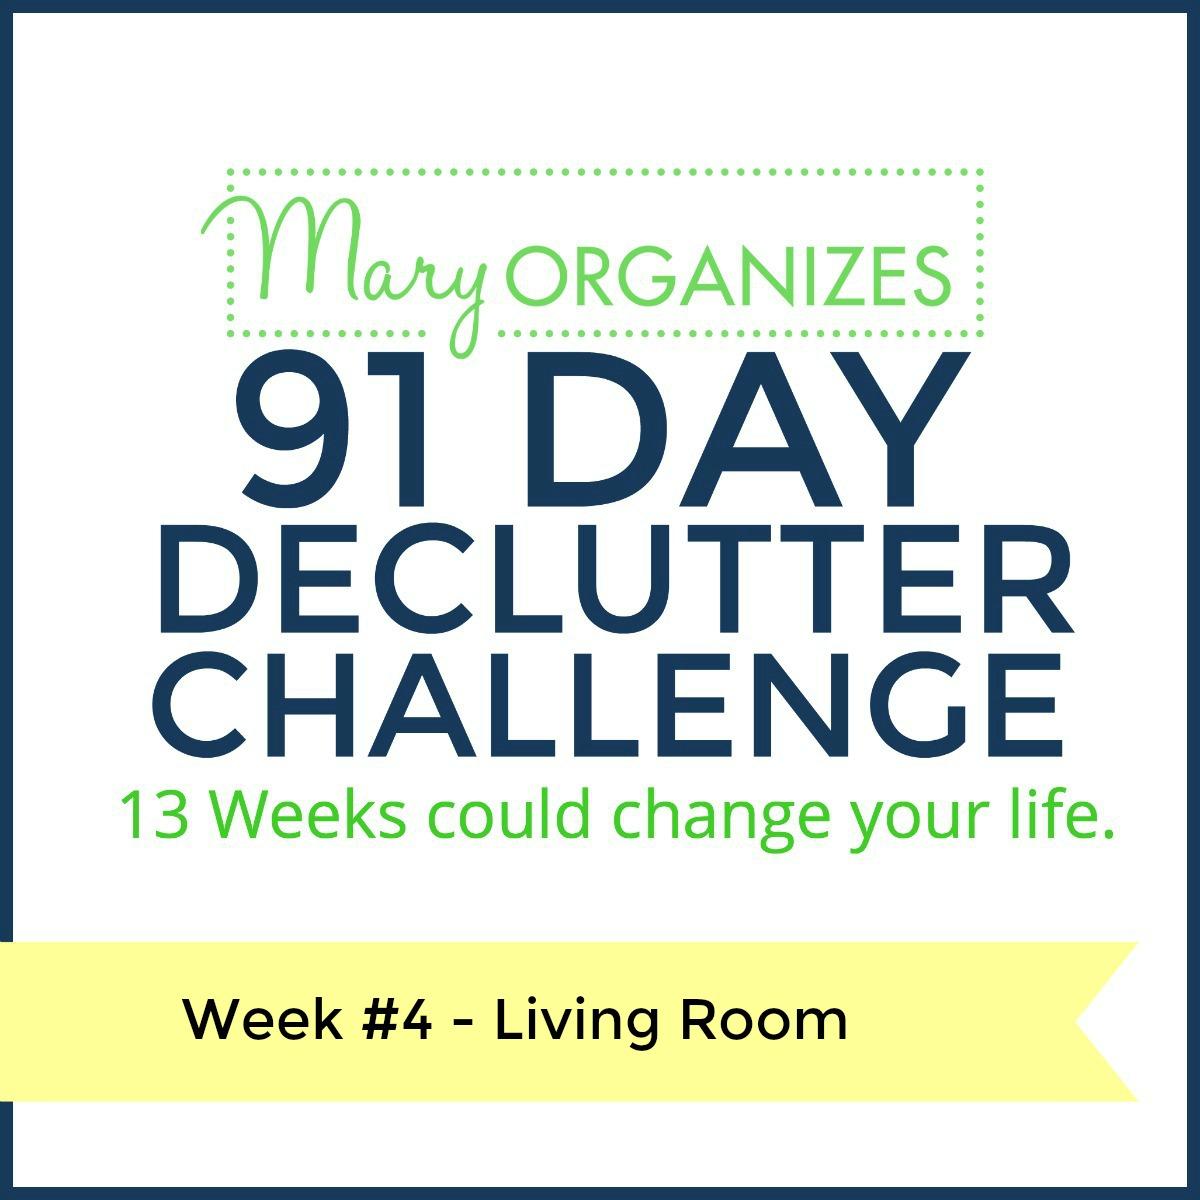 week-4-91-day-declutter-challenge-s